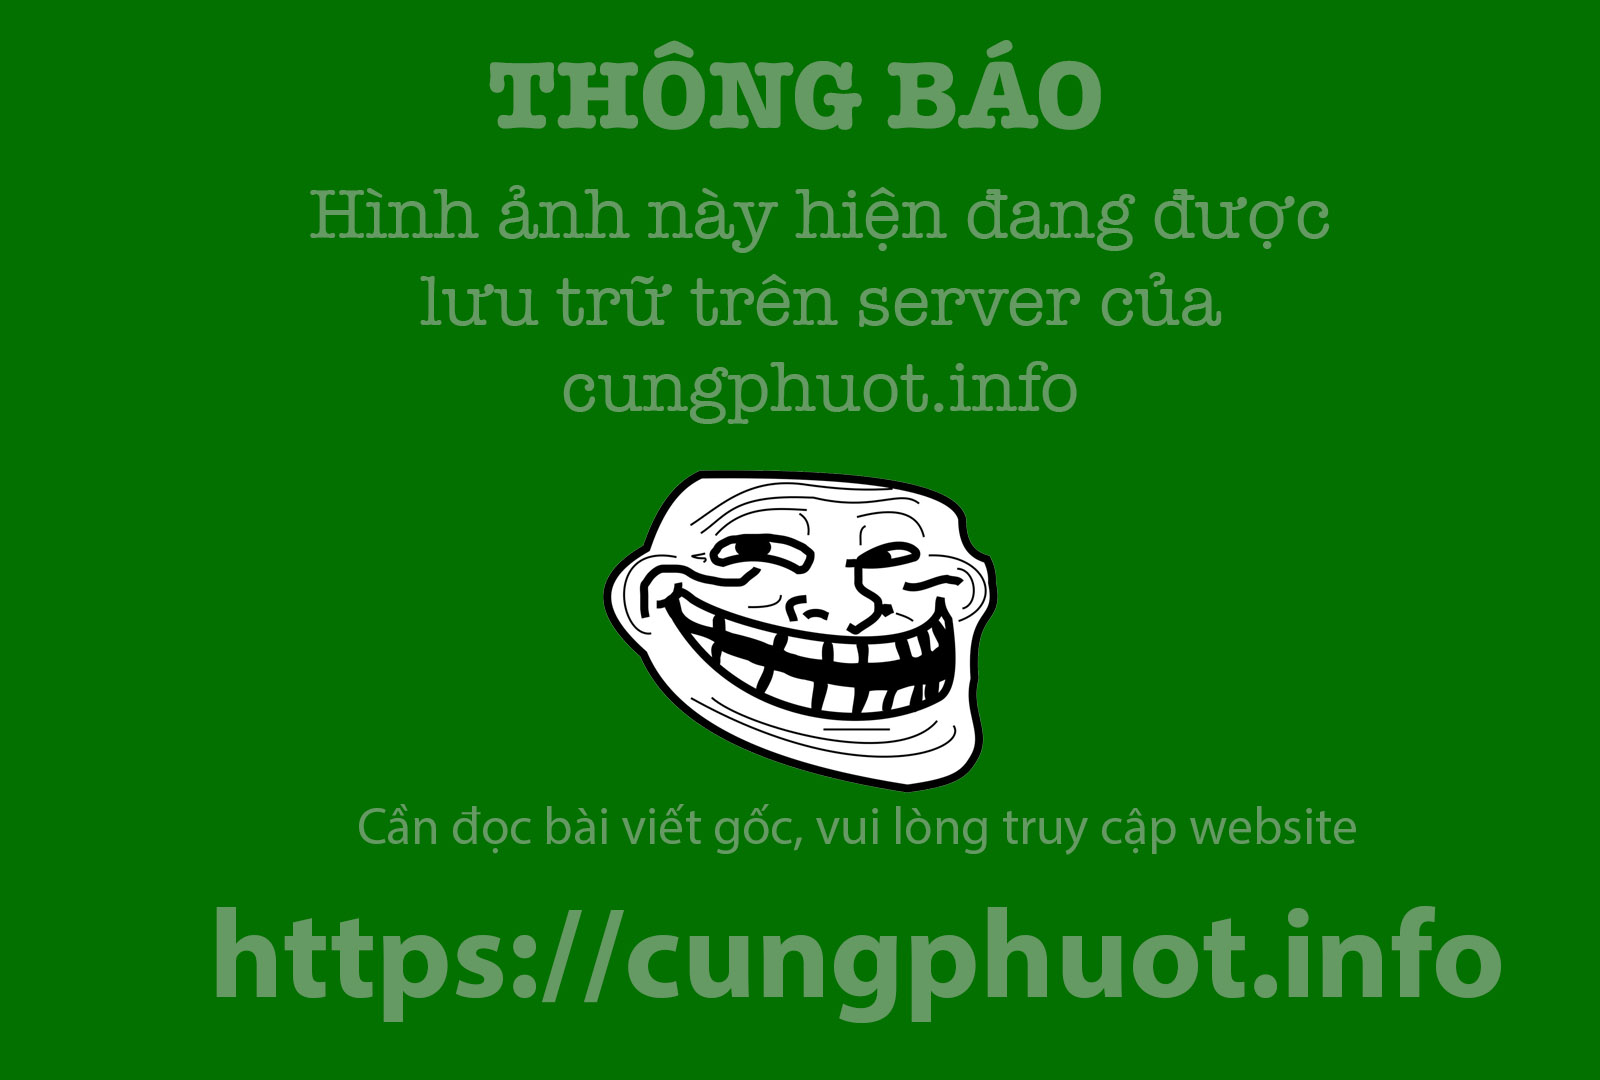 Binh minh tuyet dep tren nhung doi che Tan Cuong hinh anh 6